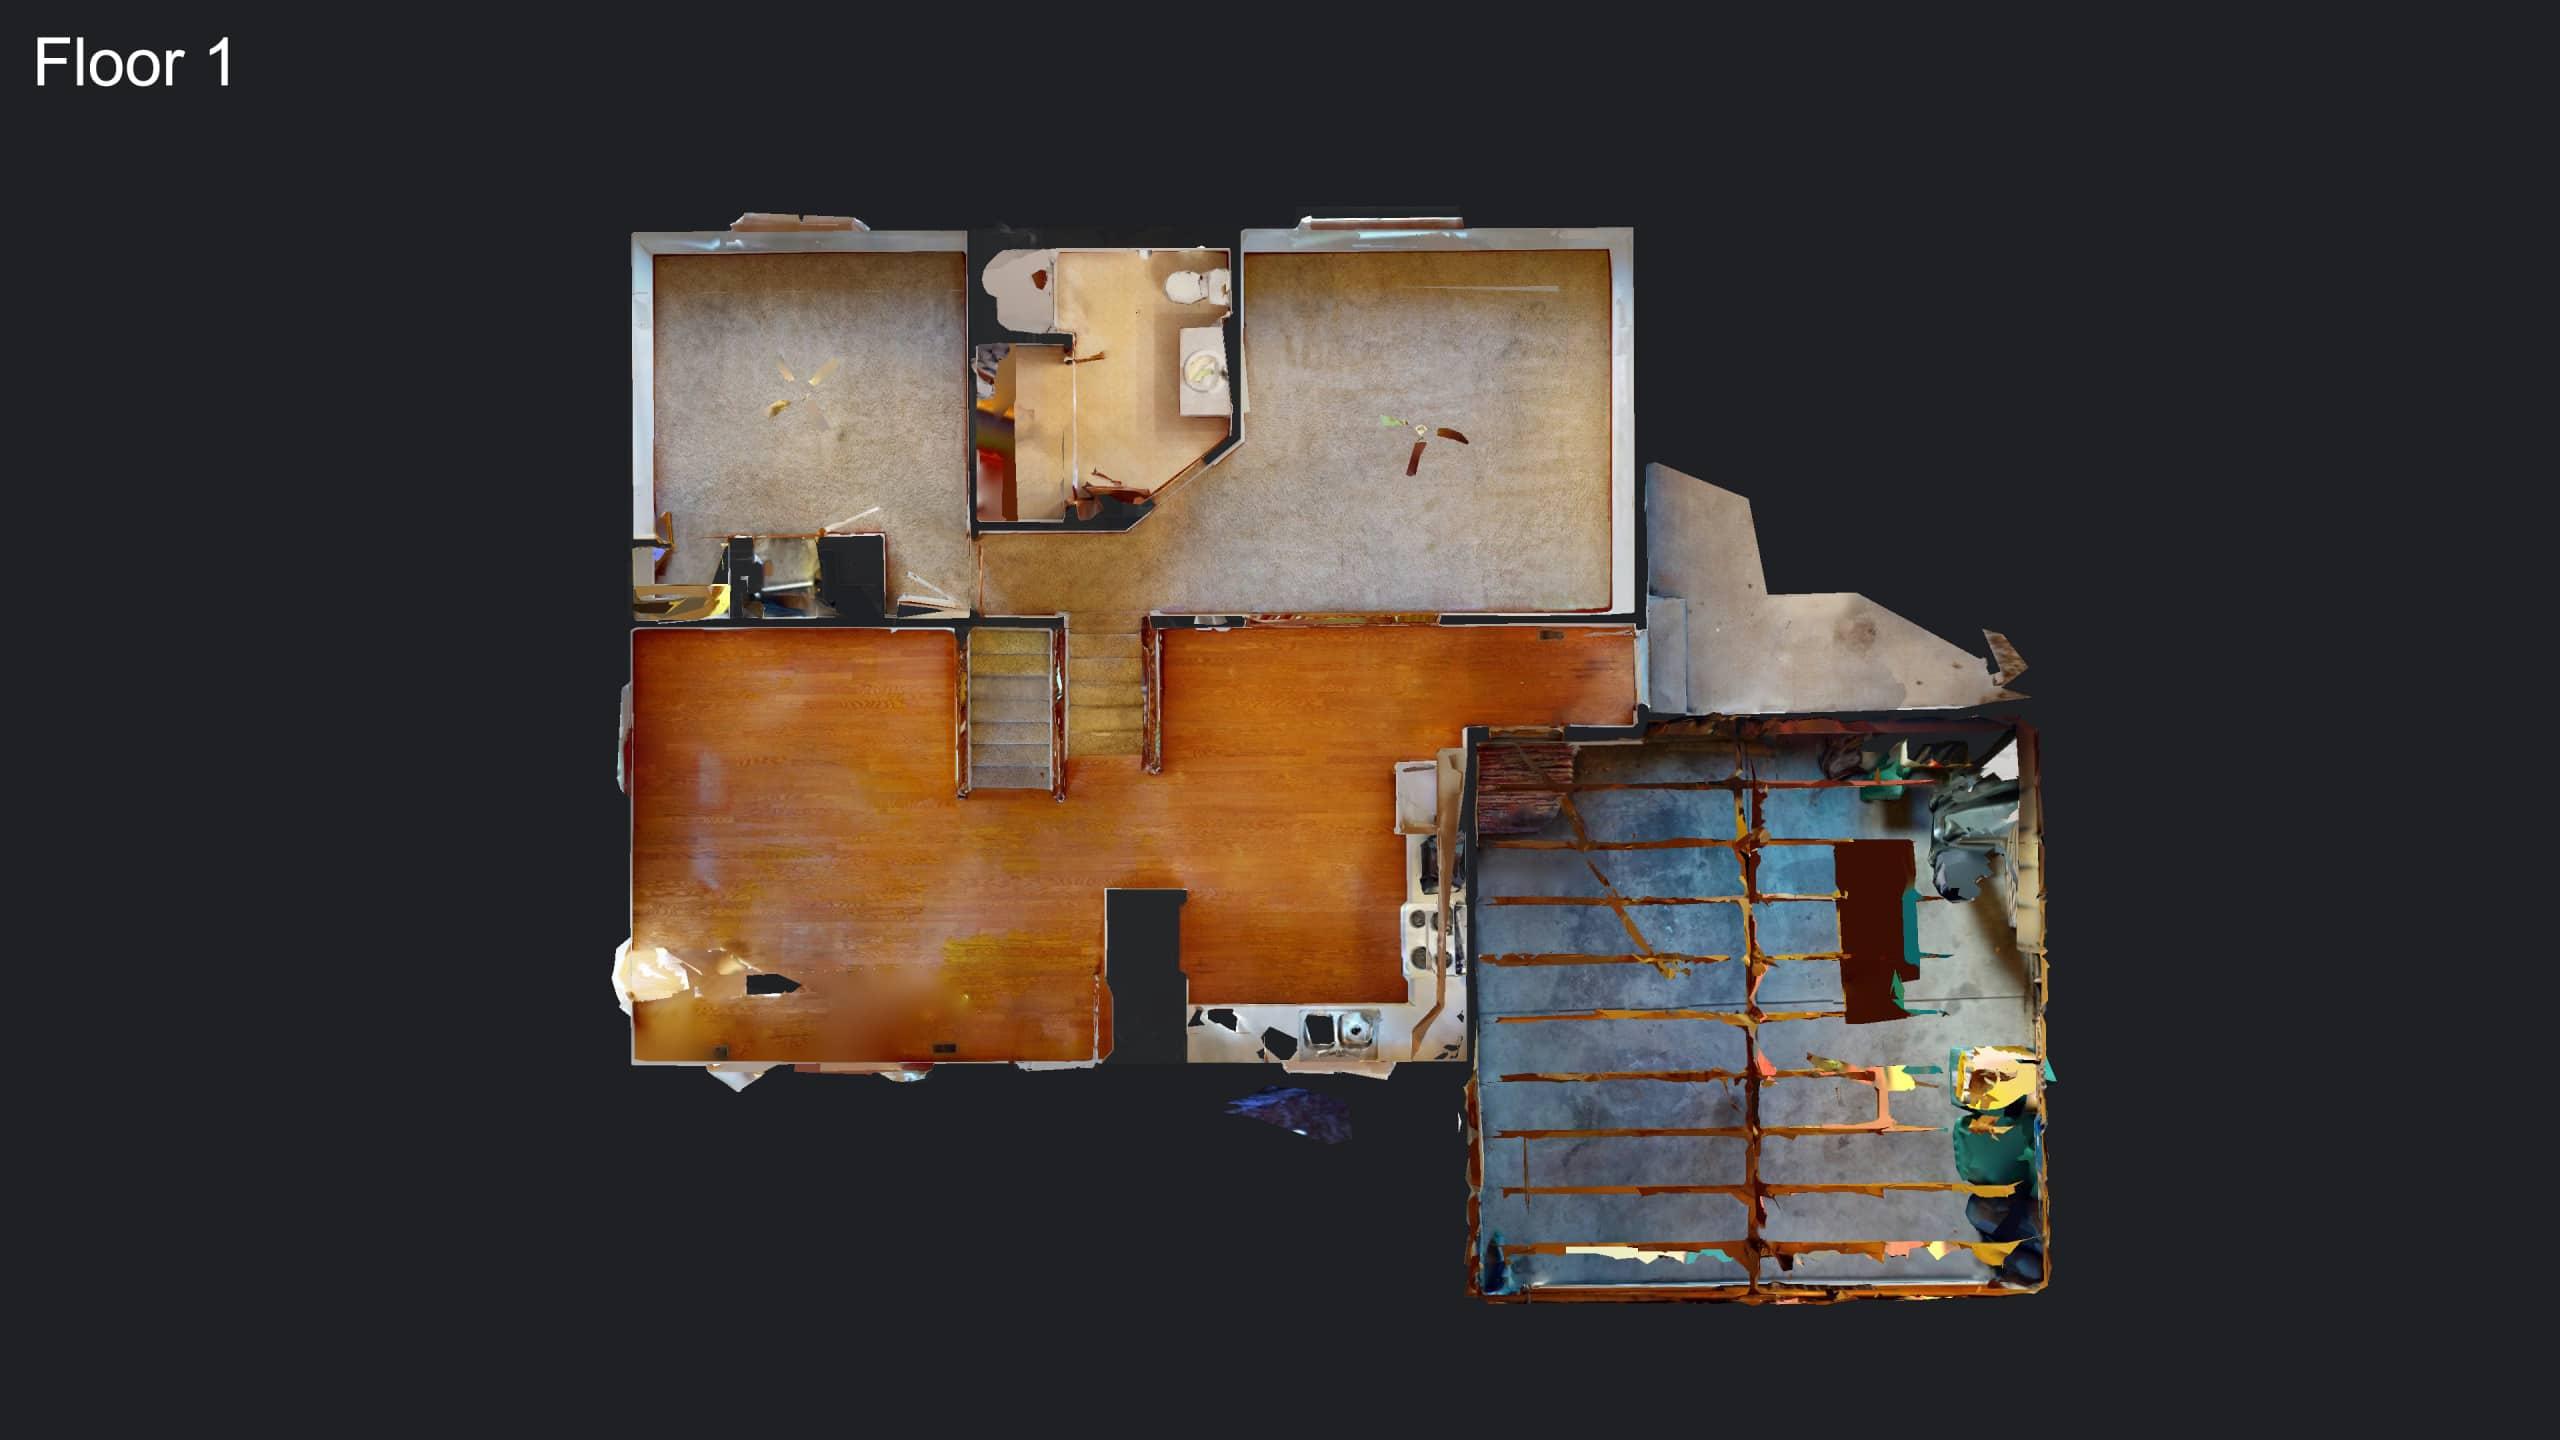 3D Main Floor Plan Drawing